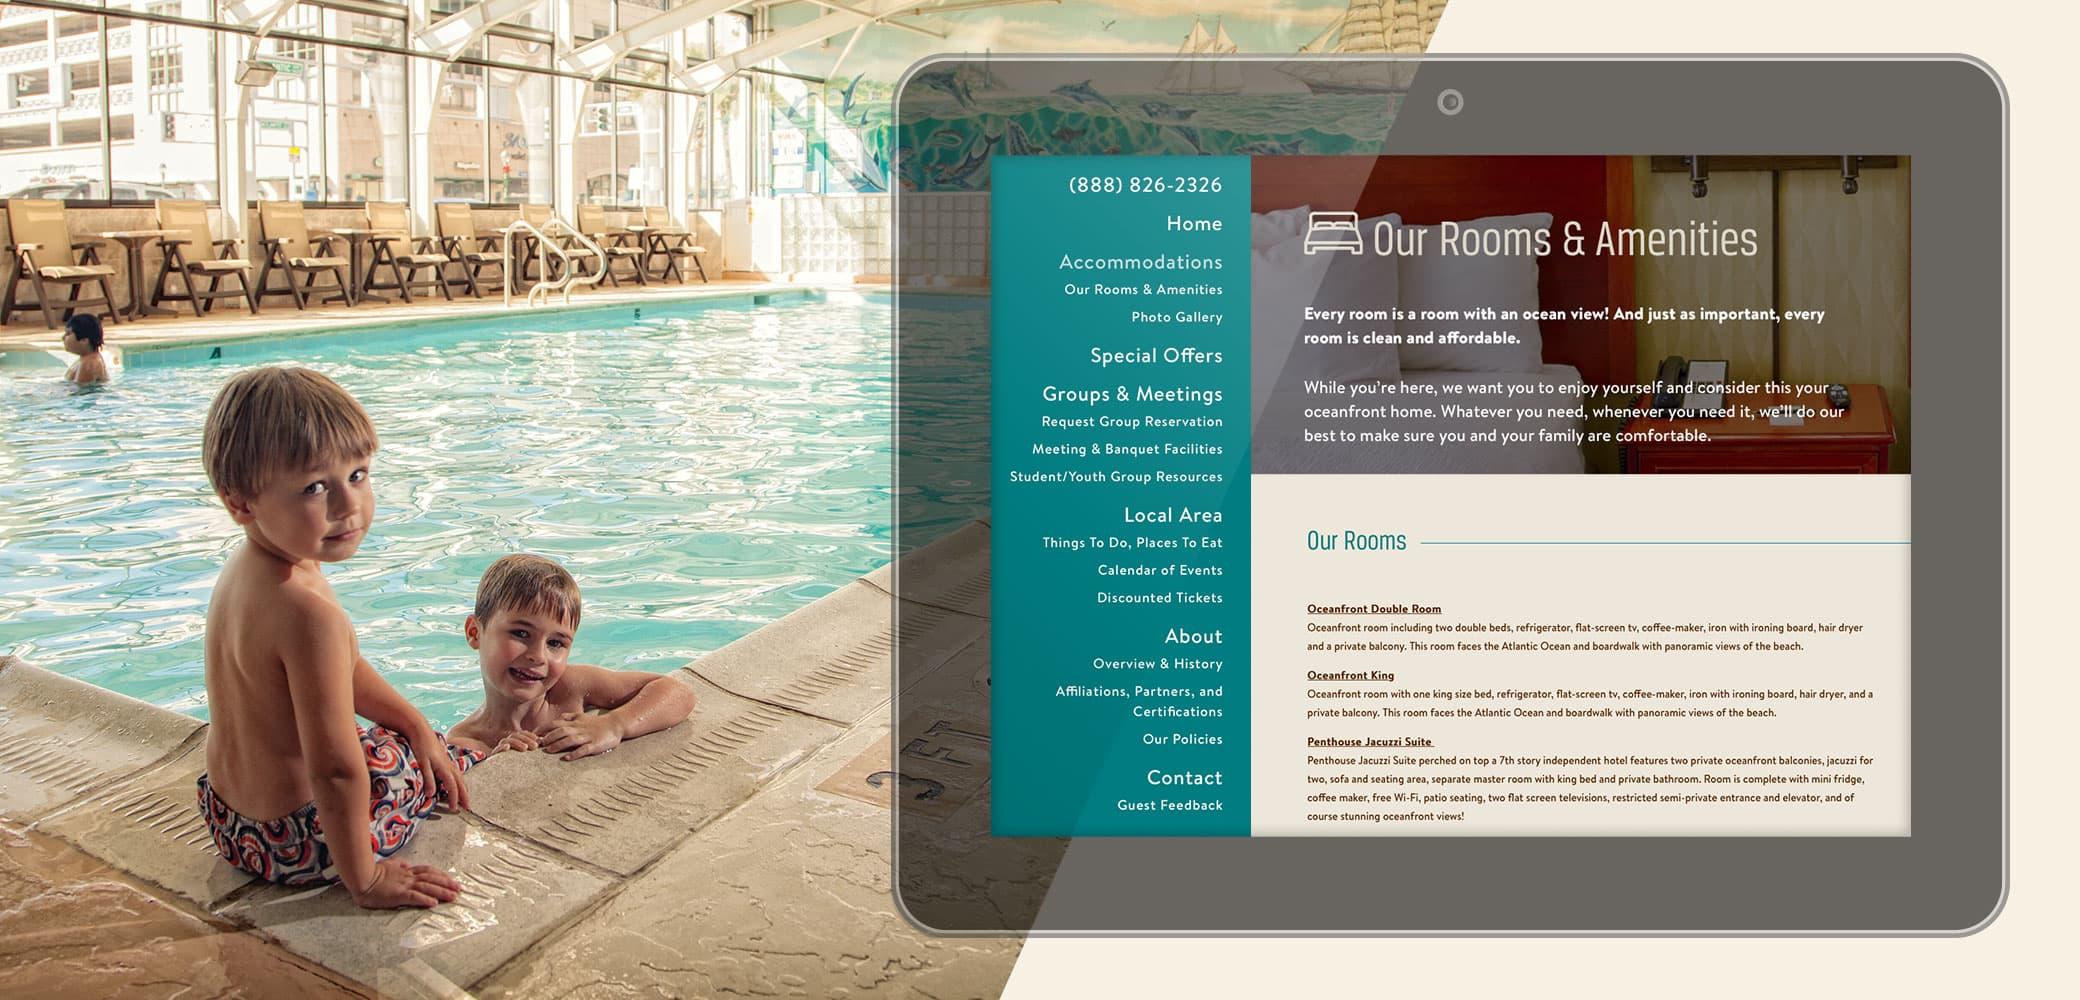 Oceanfront Inn Website Strategy, Design & Development by Red Chalk Studios